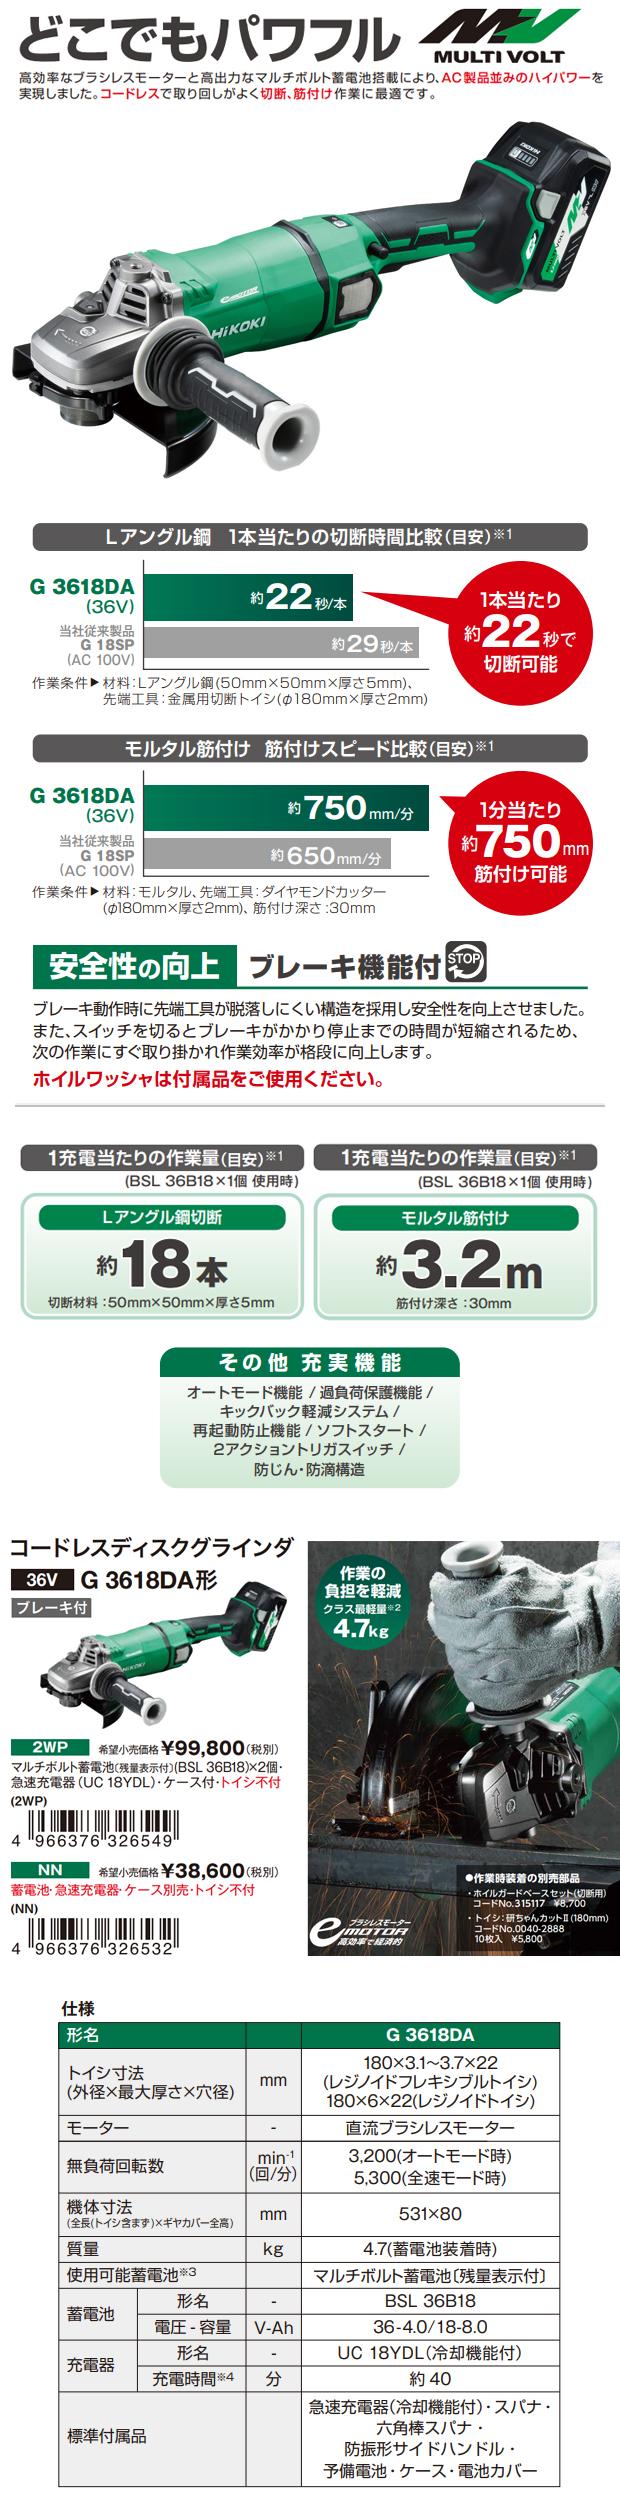 HiKOKI コードレスディスクグラインダ(ブレーキ付)  G3618DA